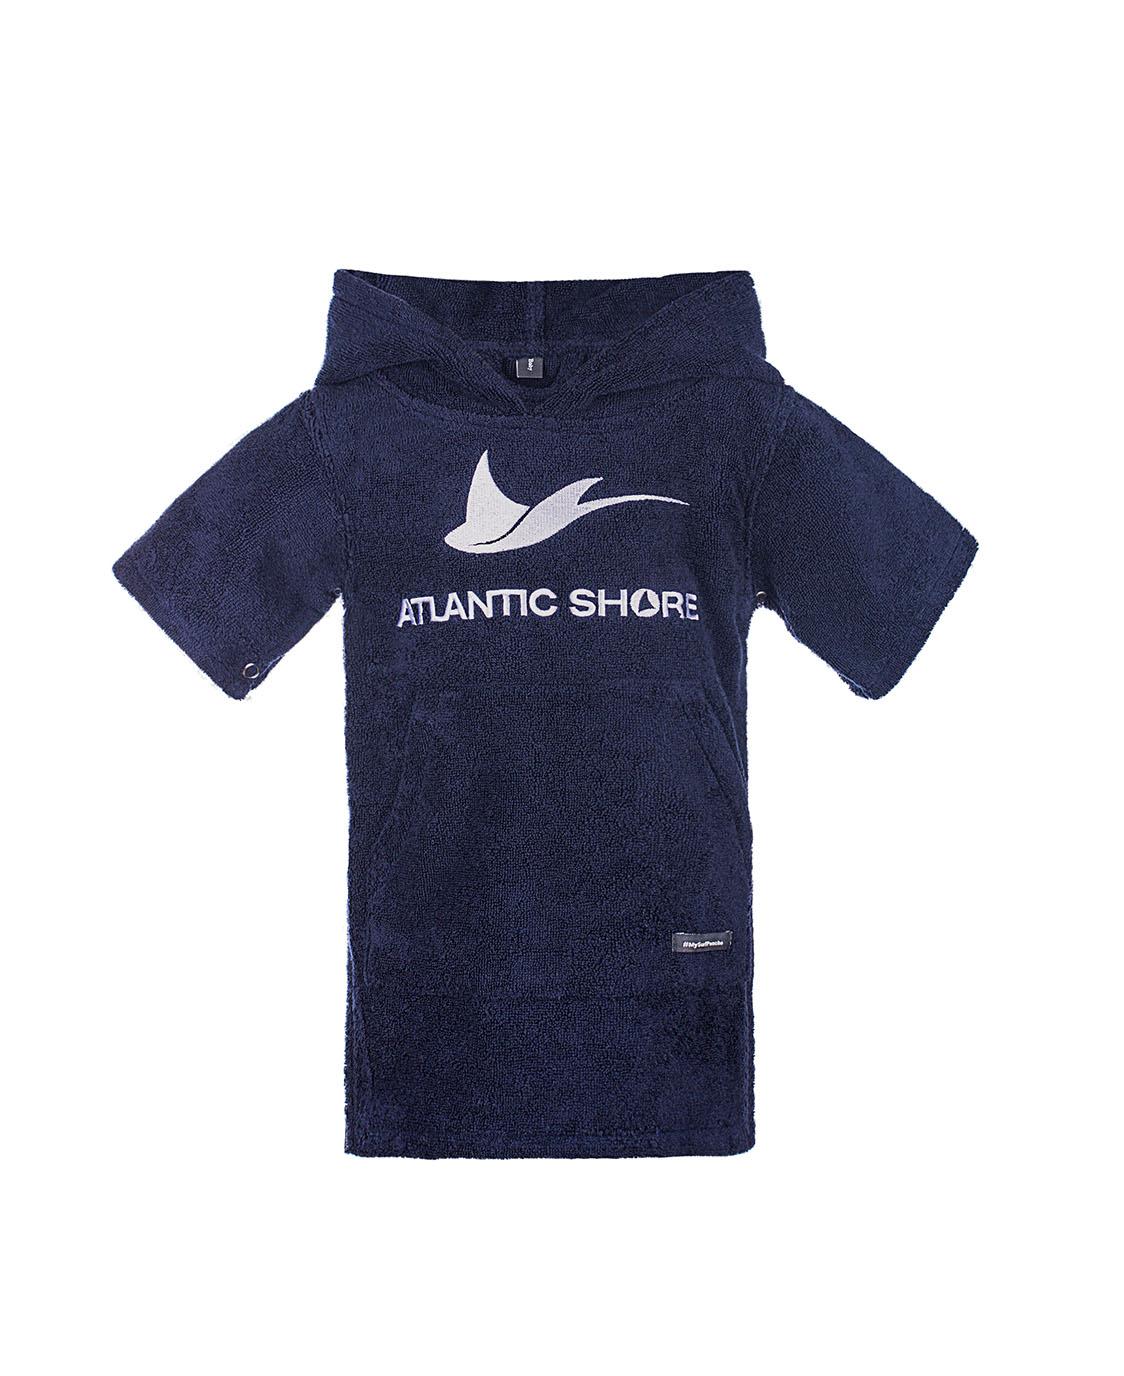 Atlantic Shore | Surf Poncho | Basic | Baby | Navy Blue